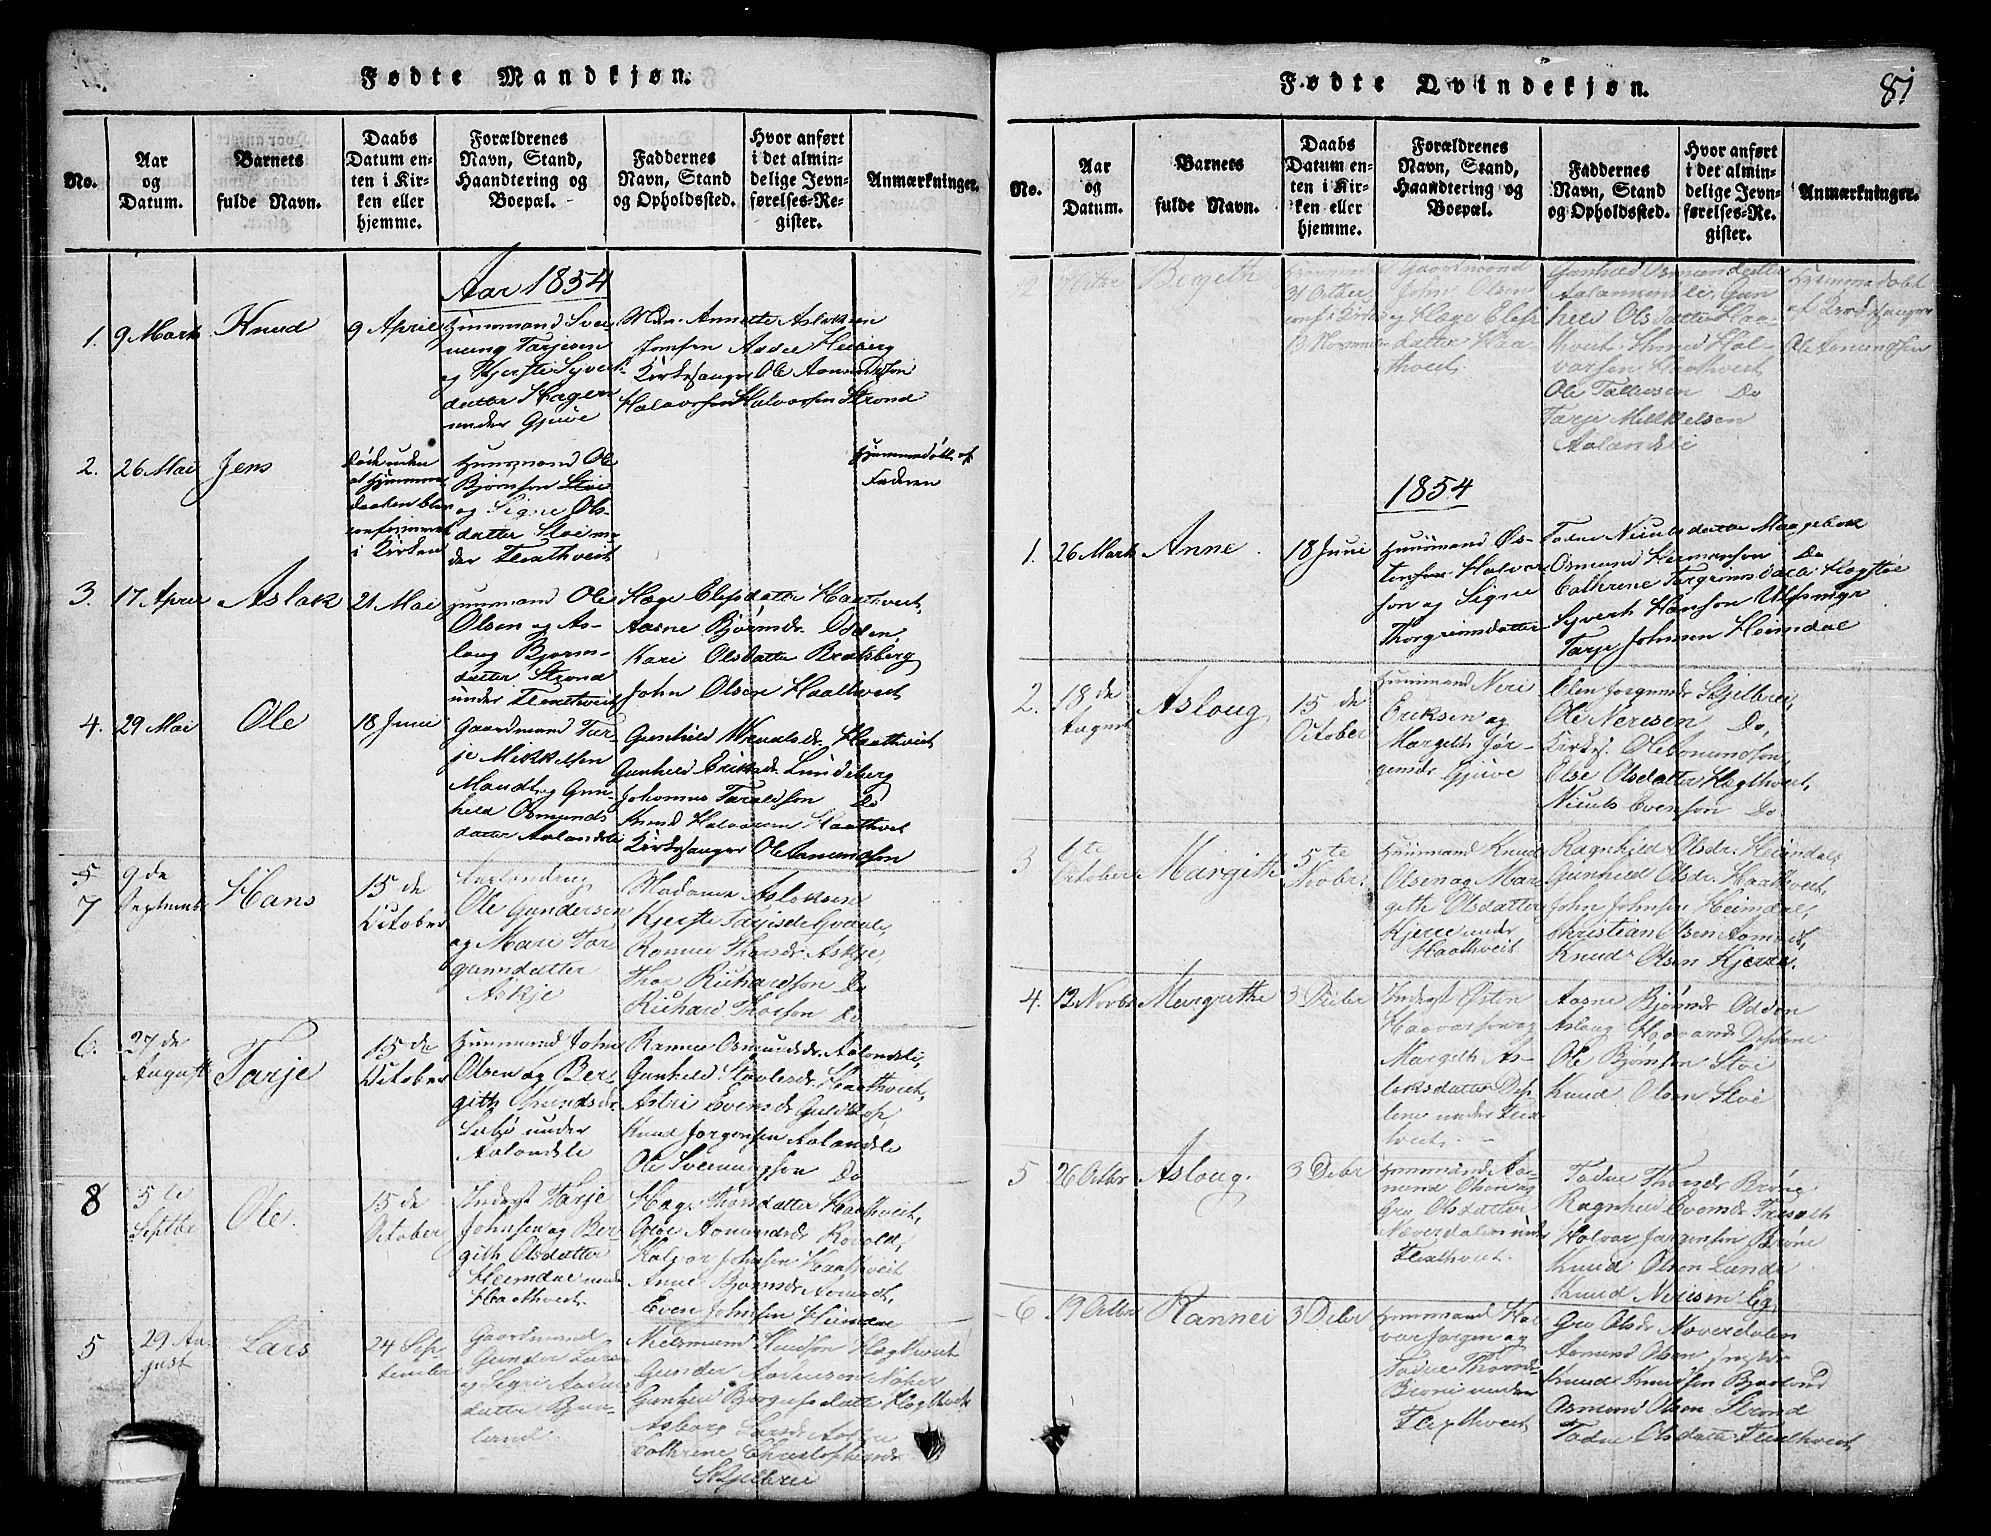 SAKO, Lårdal kirkebøker, G/Ga/L0001: Klokkerbok nr. I 1, 1815-1861, s. 81